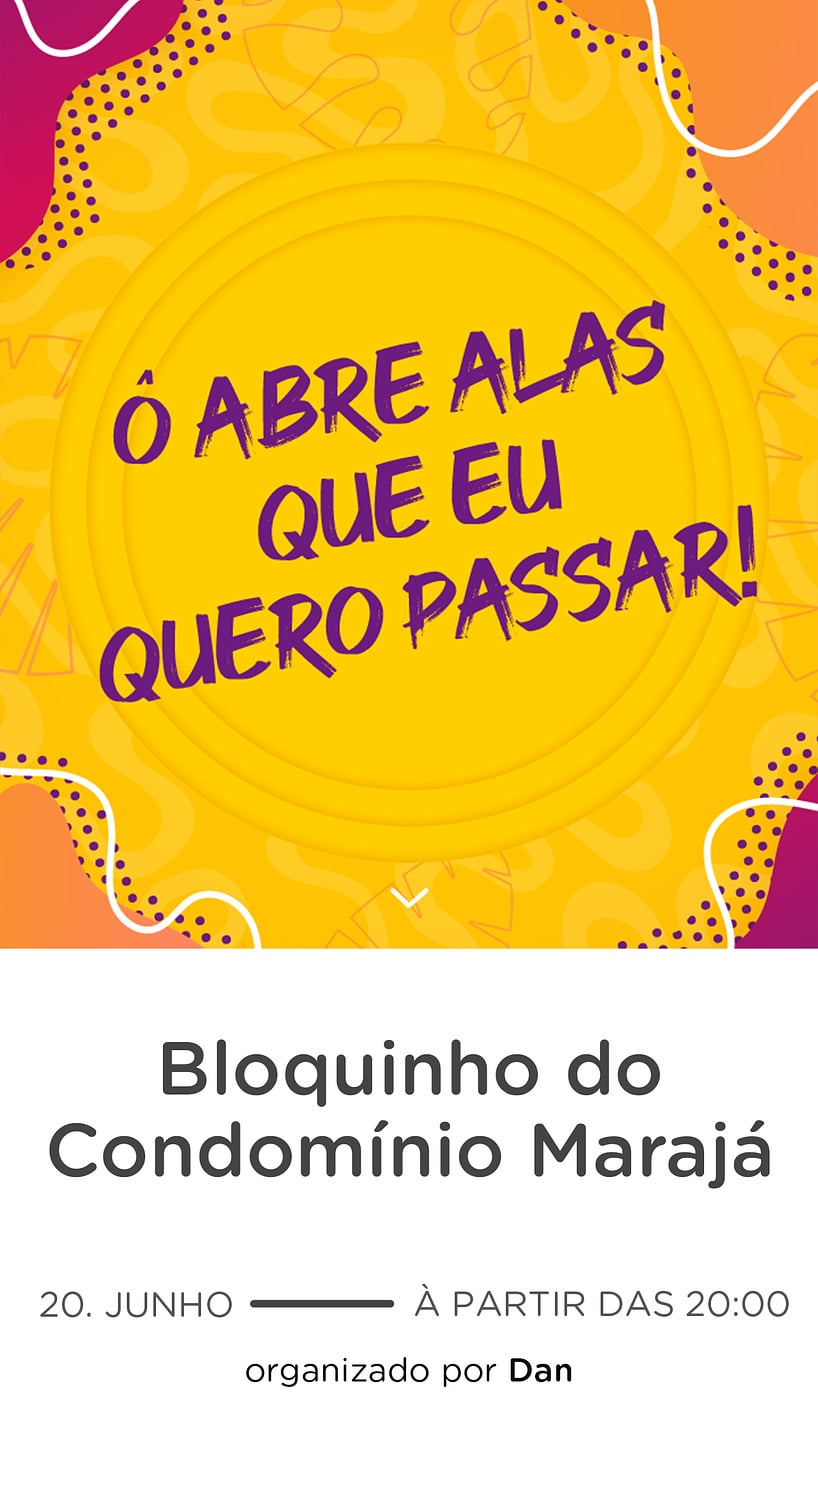 Convite Gratis para Editar - Carnaval Bloco